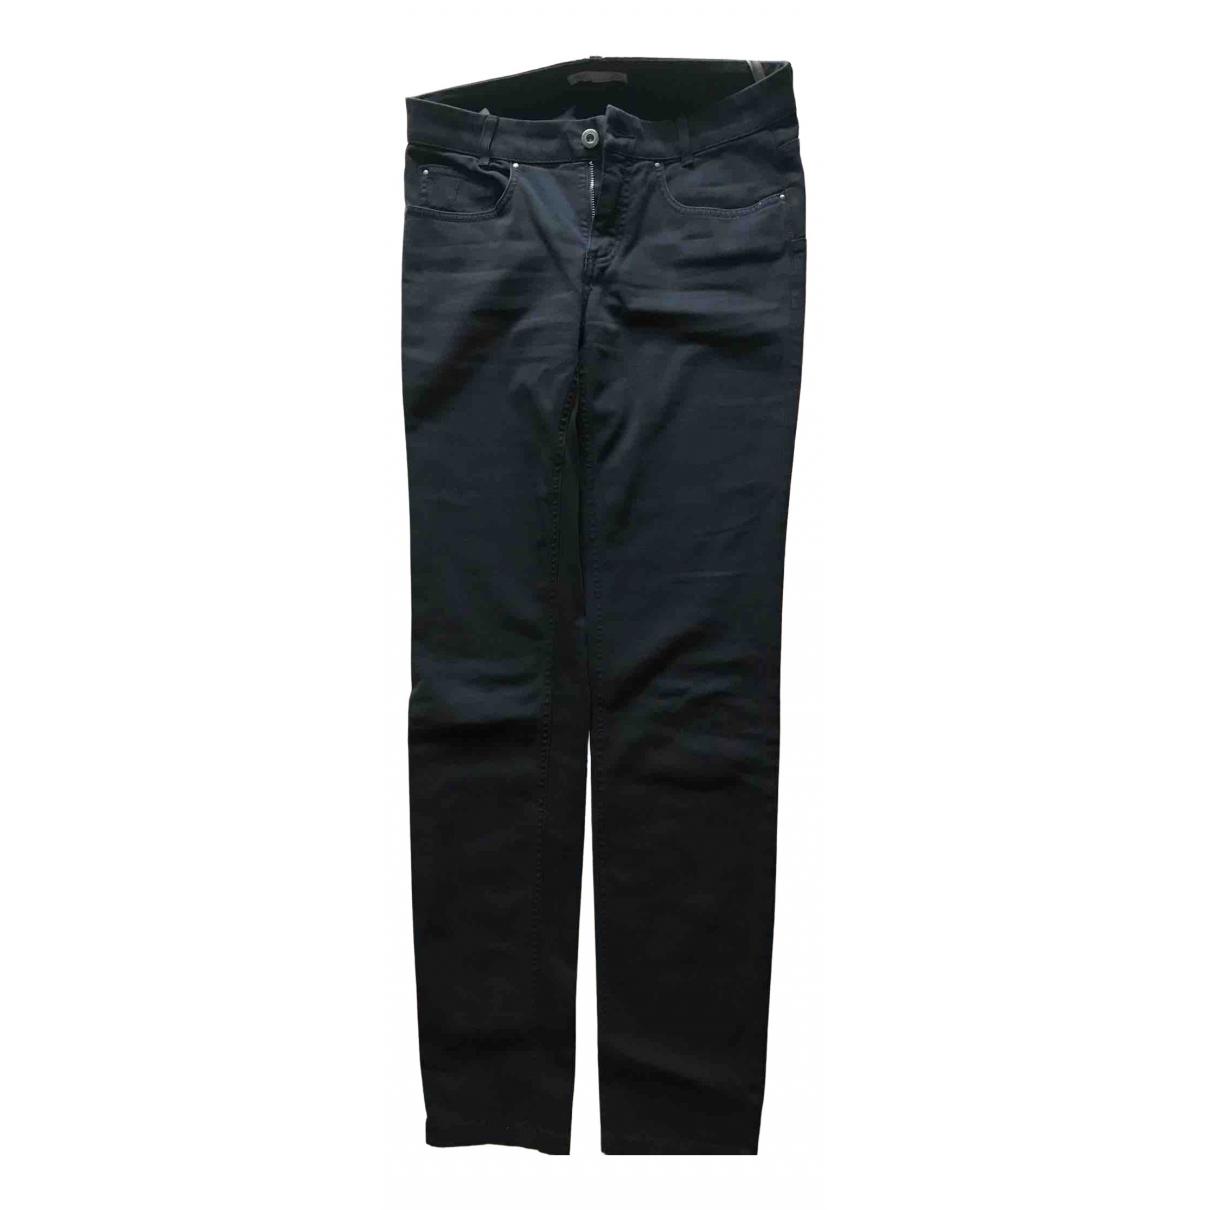 Fabiana Filippi N Navy Cotton Trousers for Women 40 IT